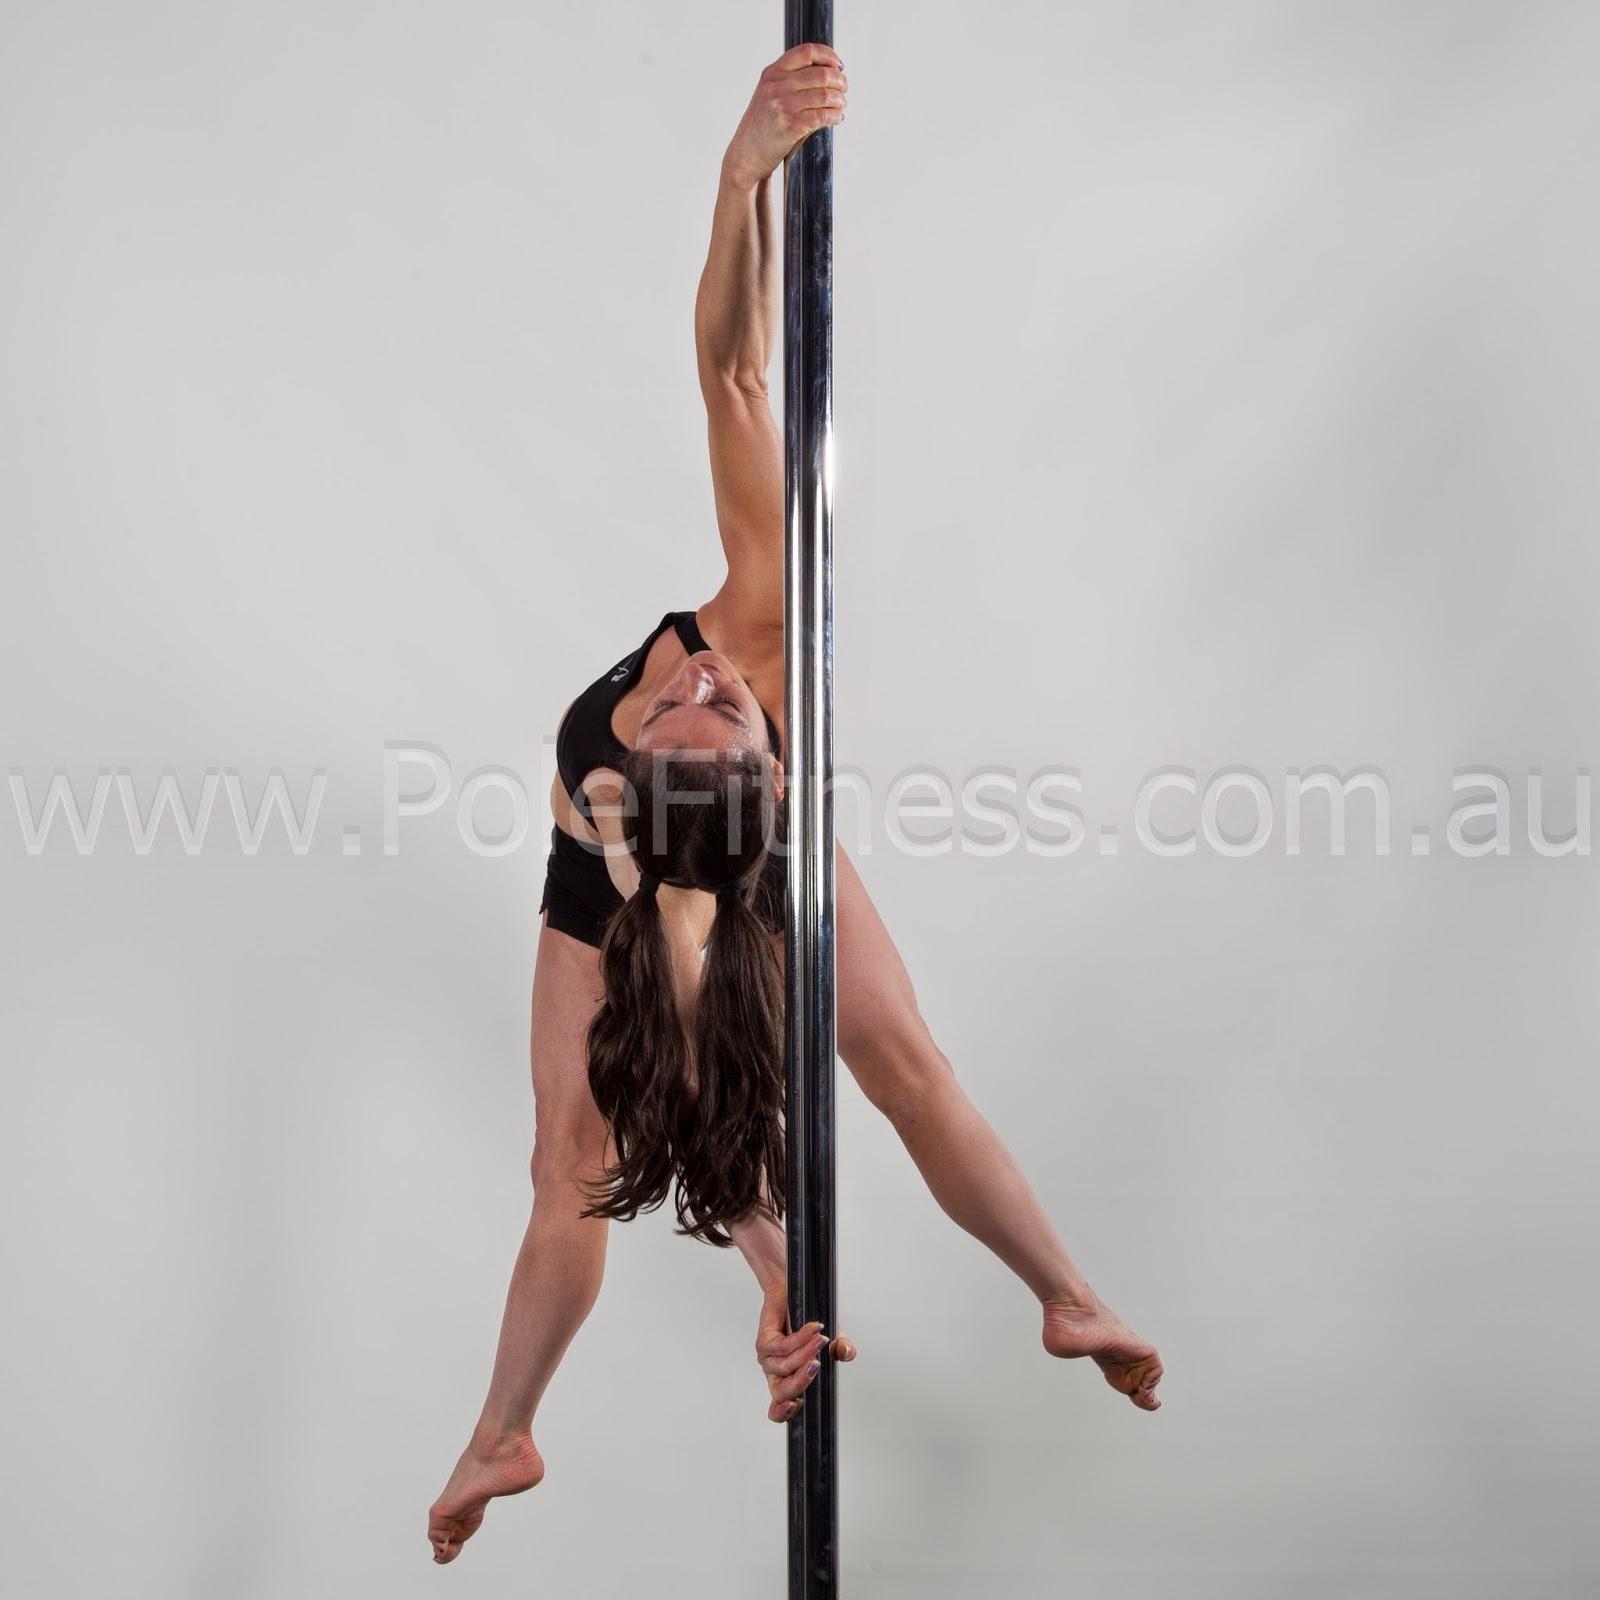 polefitness.com.au